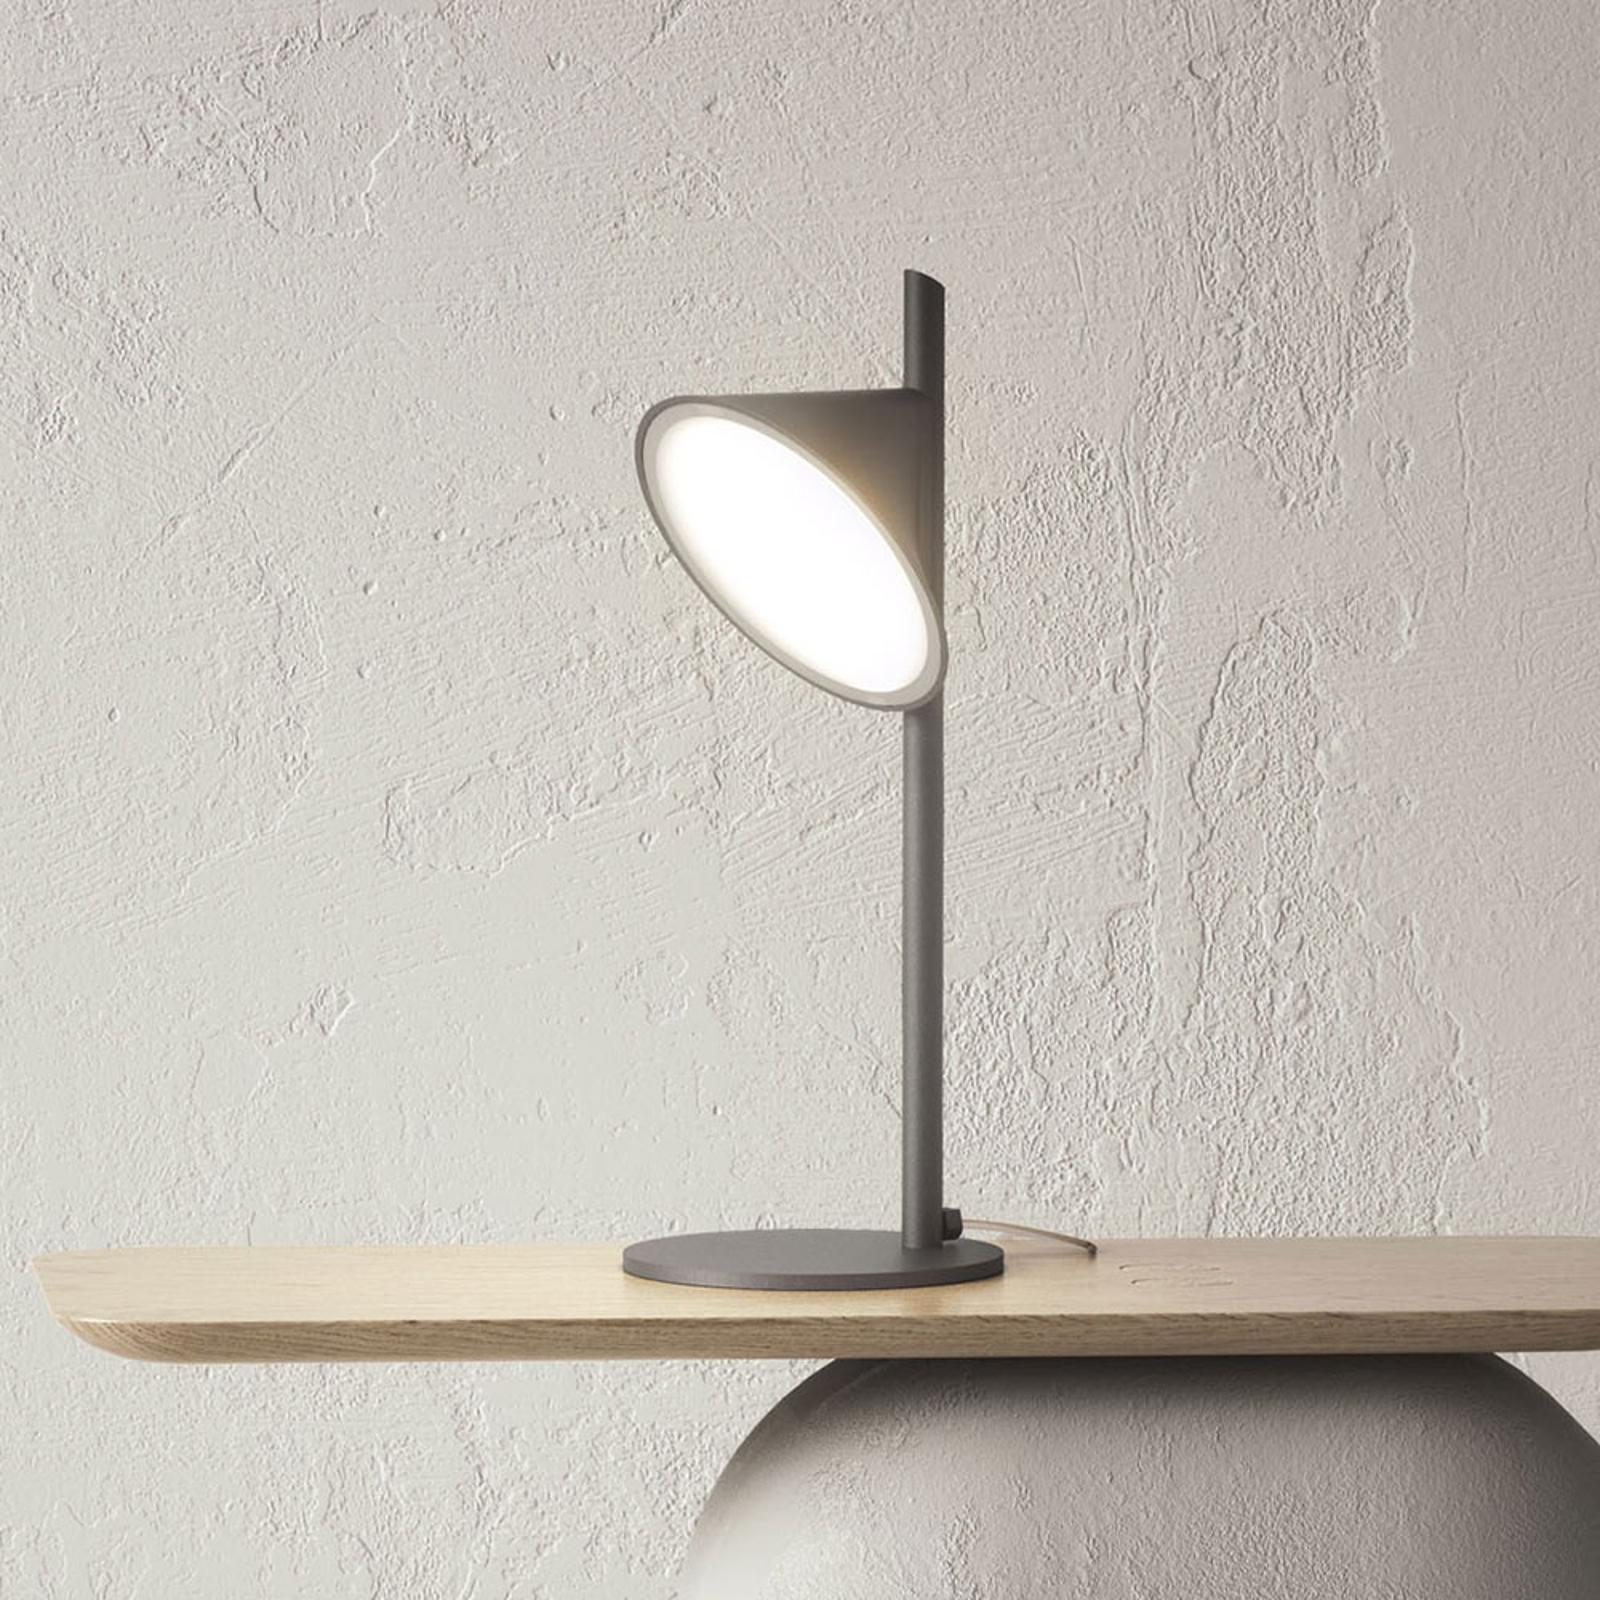 Axolight Orchid LED tafellamp, donkergrijs